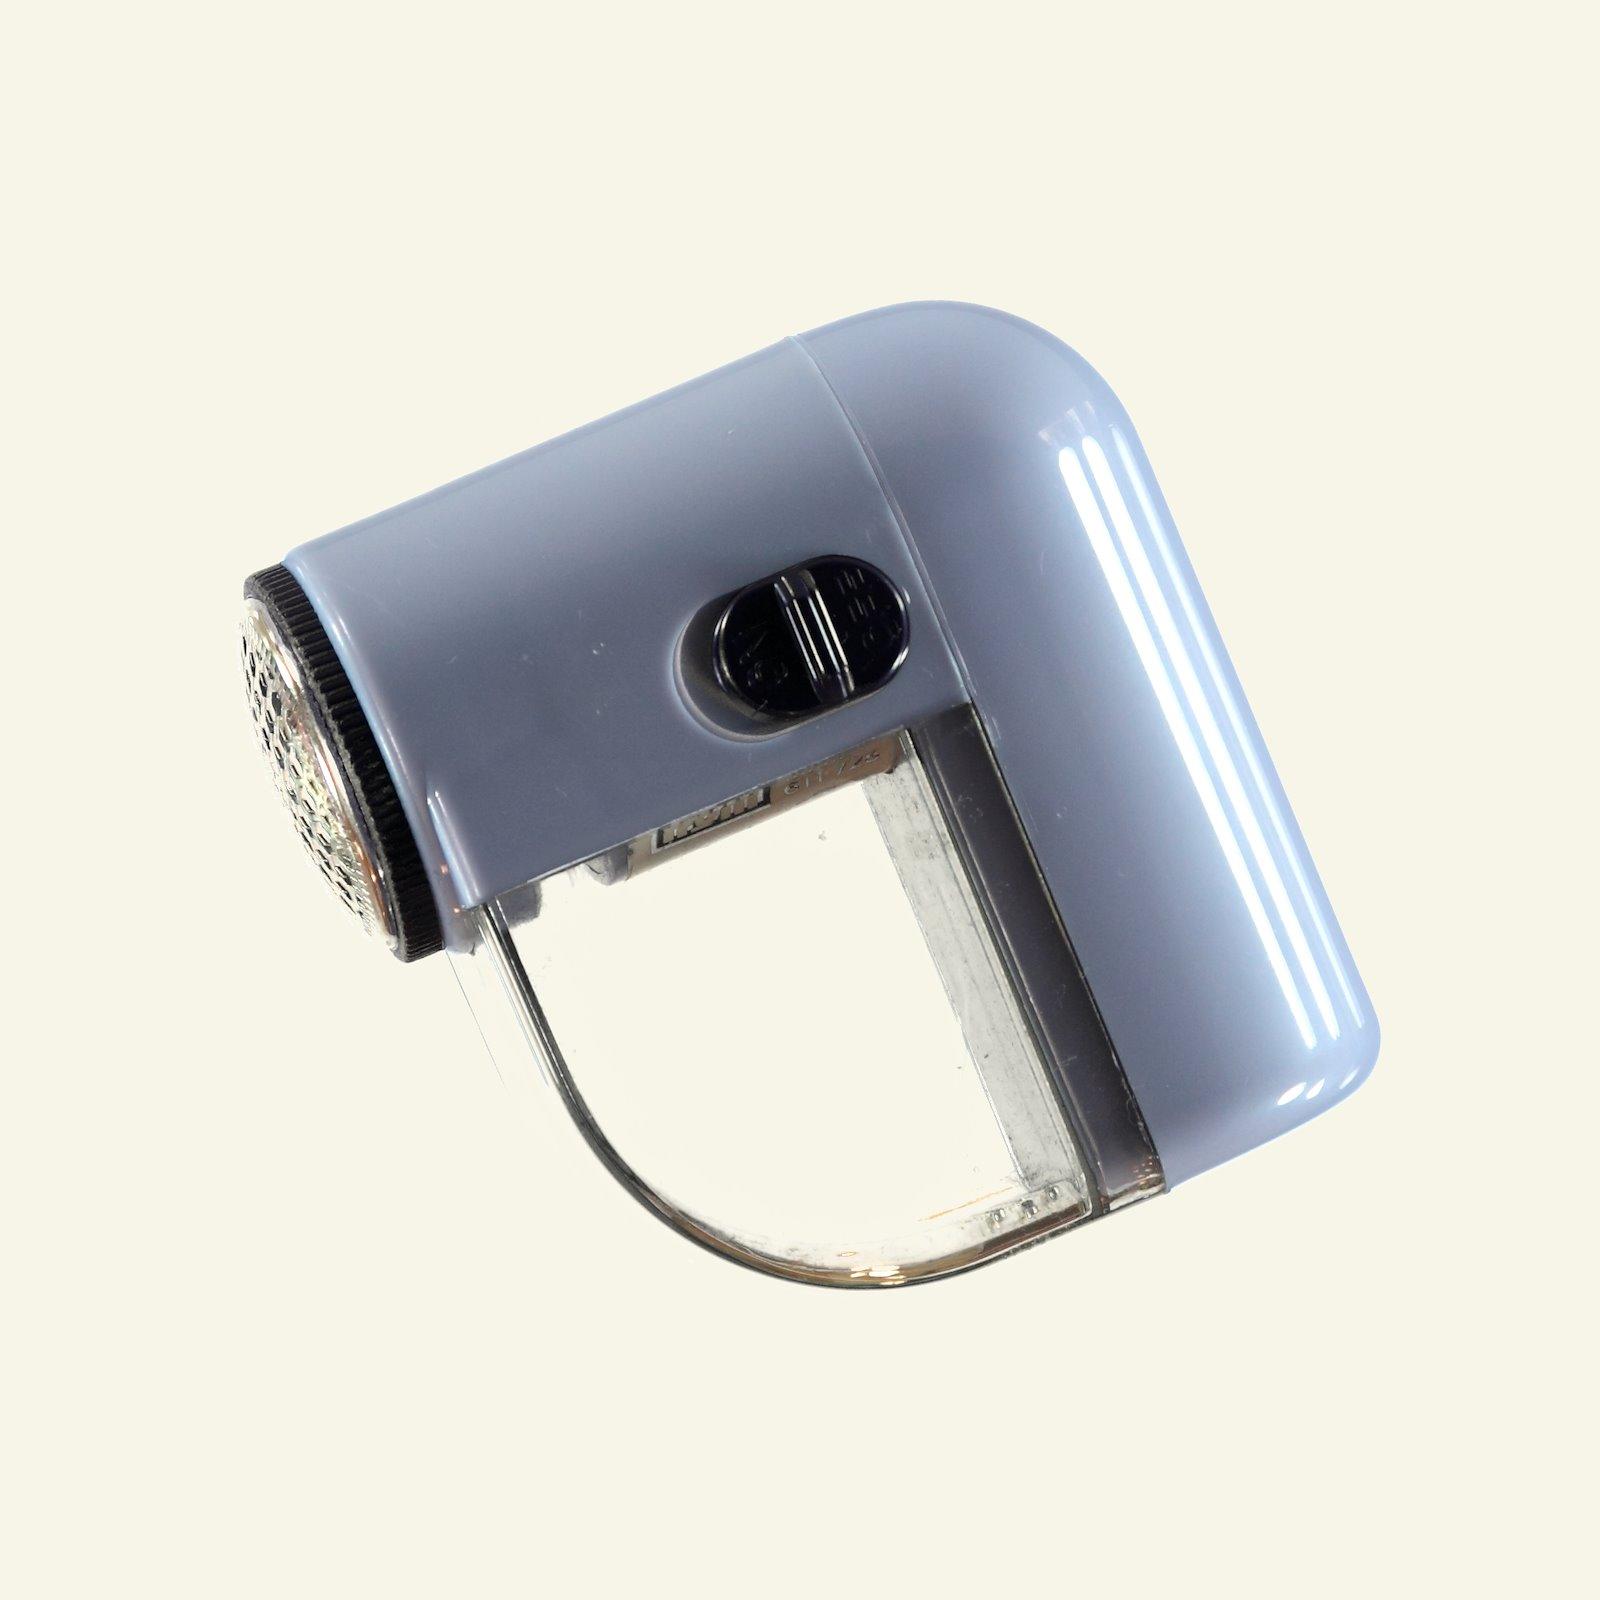 Prym lint shaver mini 46221_pack